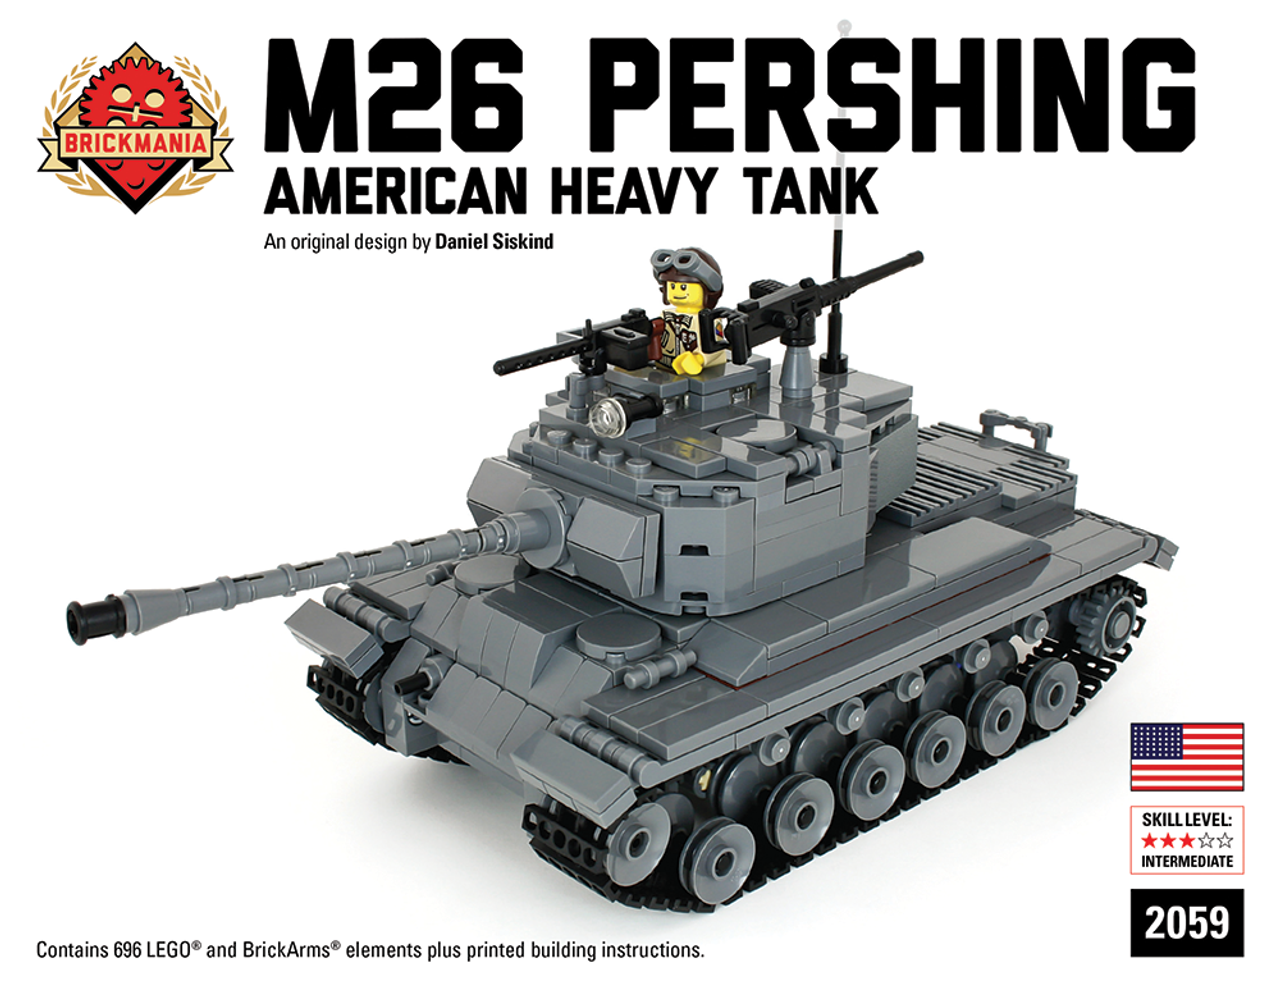 M26 Pershing Tank - Premium Black Box Edition Kit